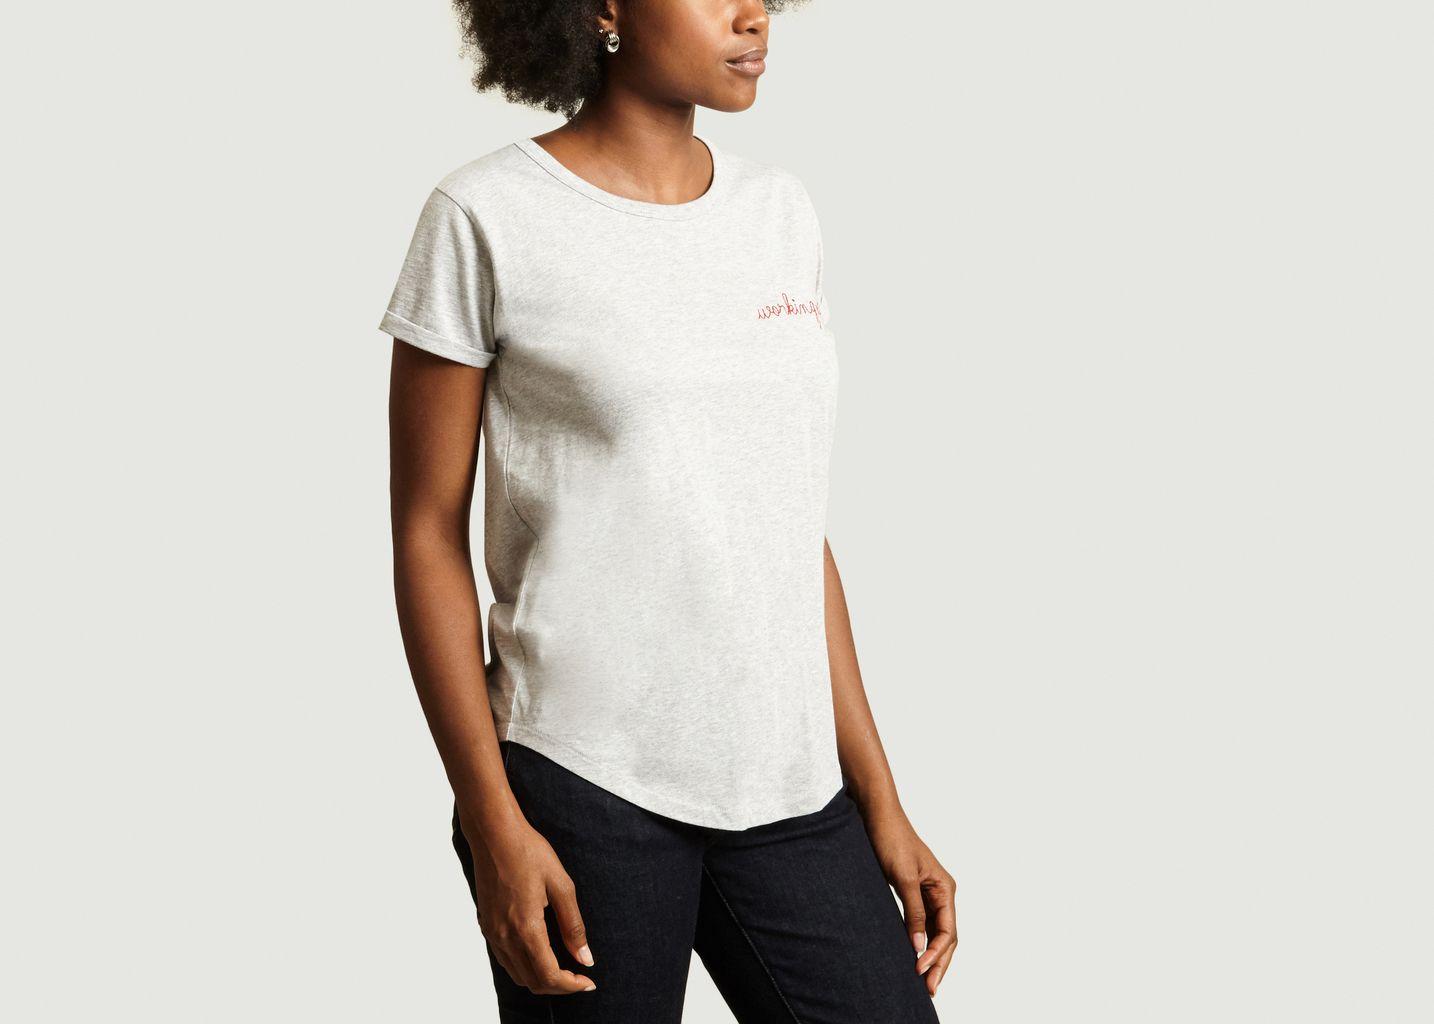 T-shirt Working Girl - Maison Labiche